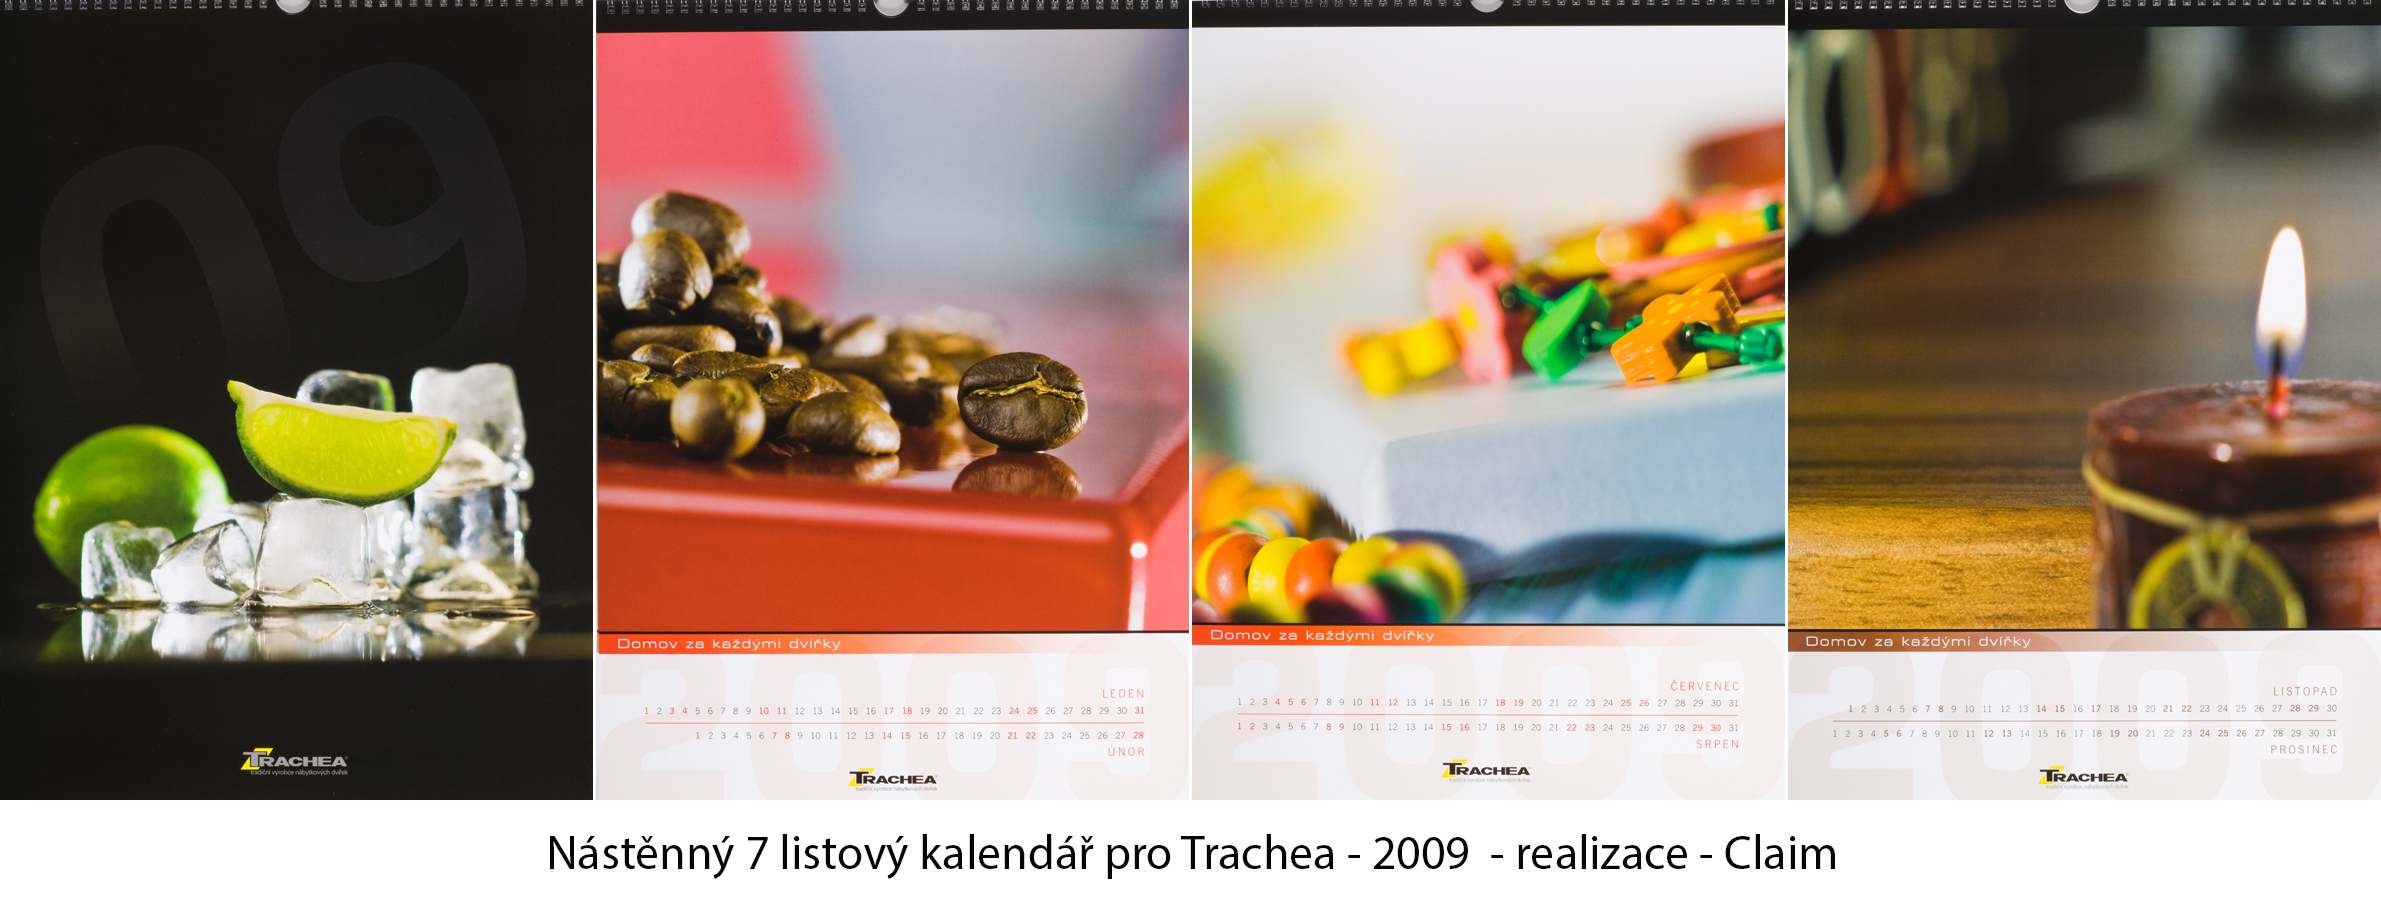 2009-Trachea.jpg